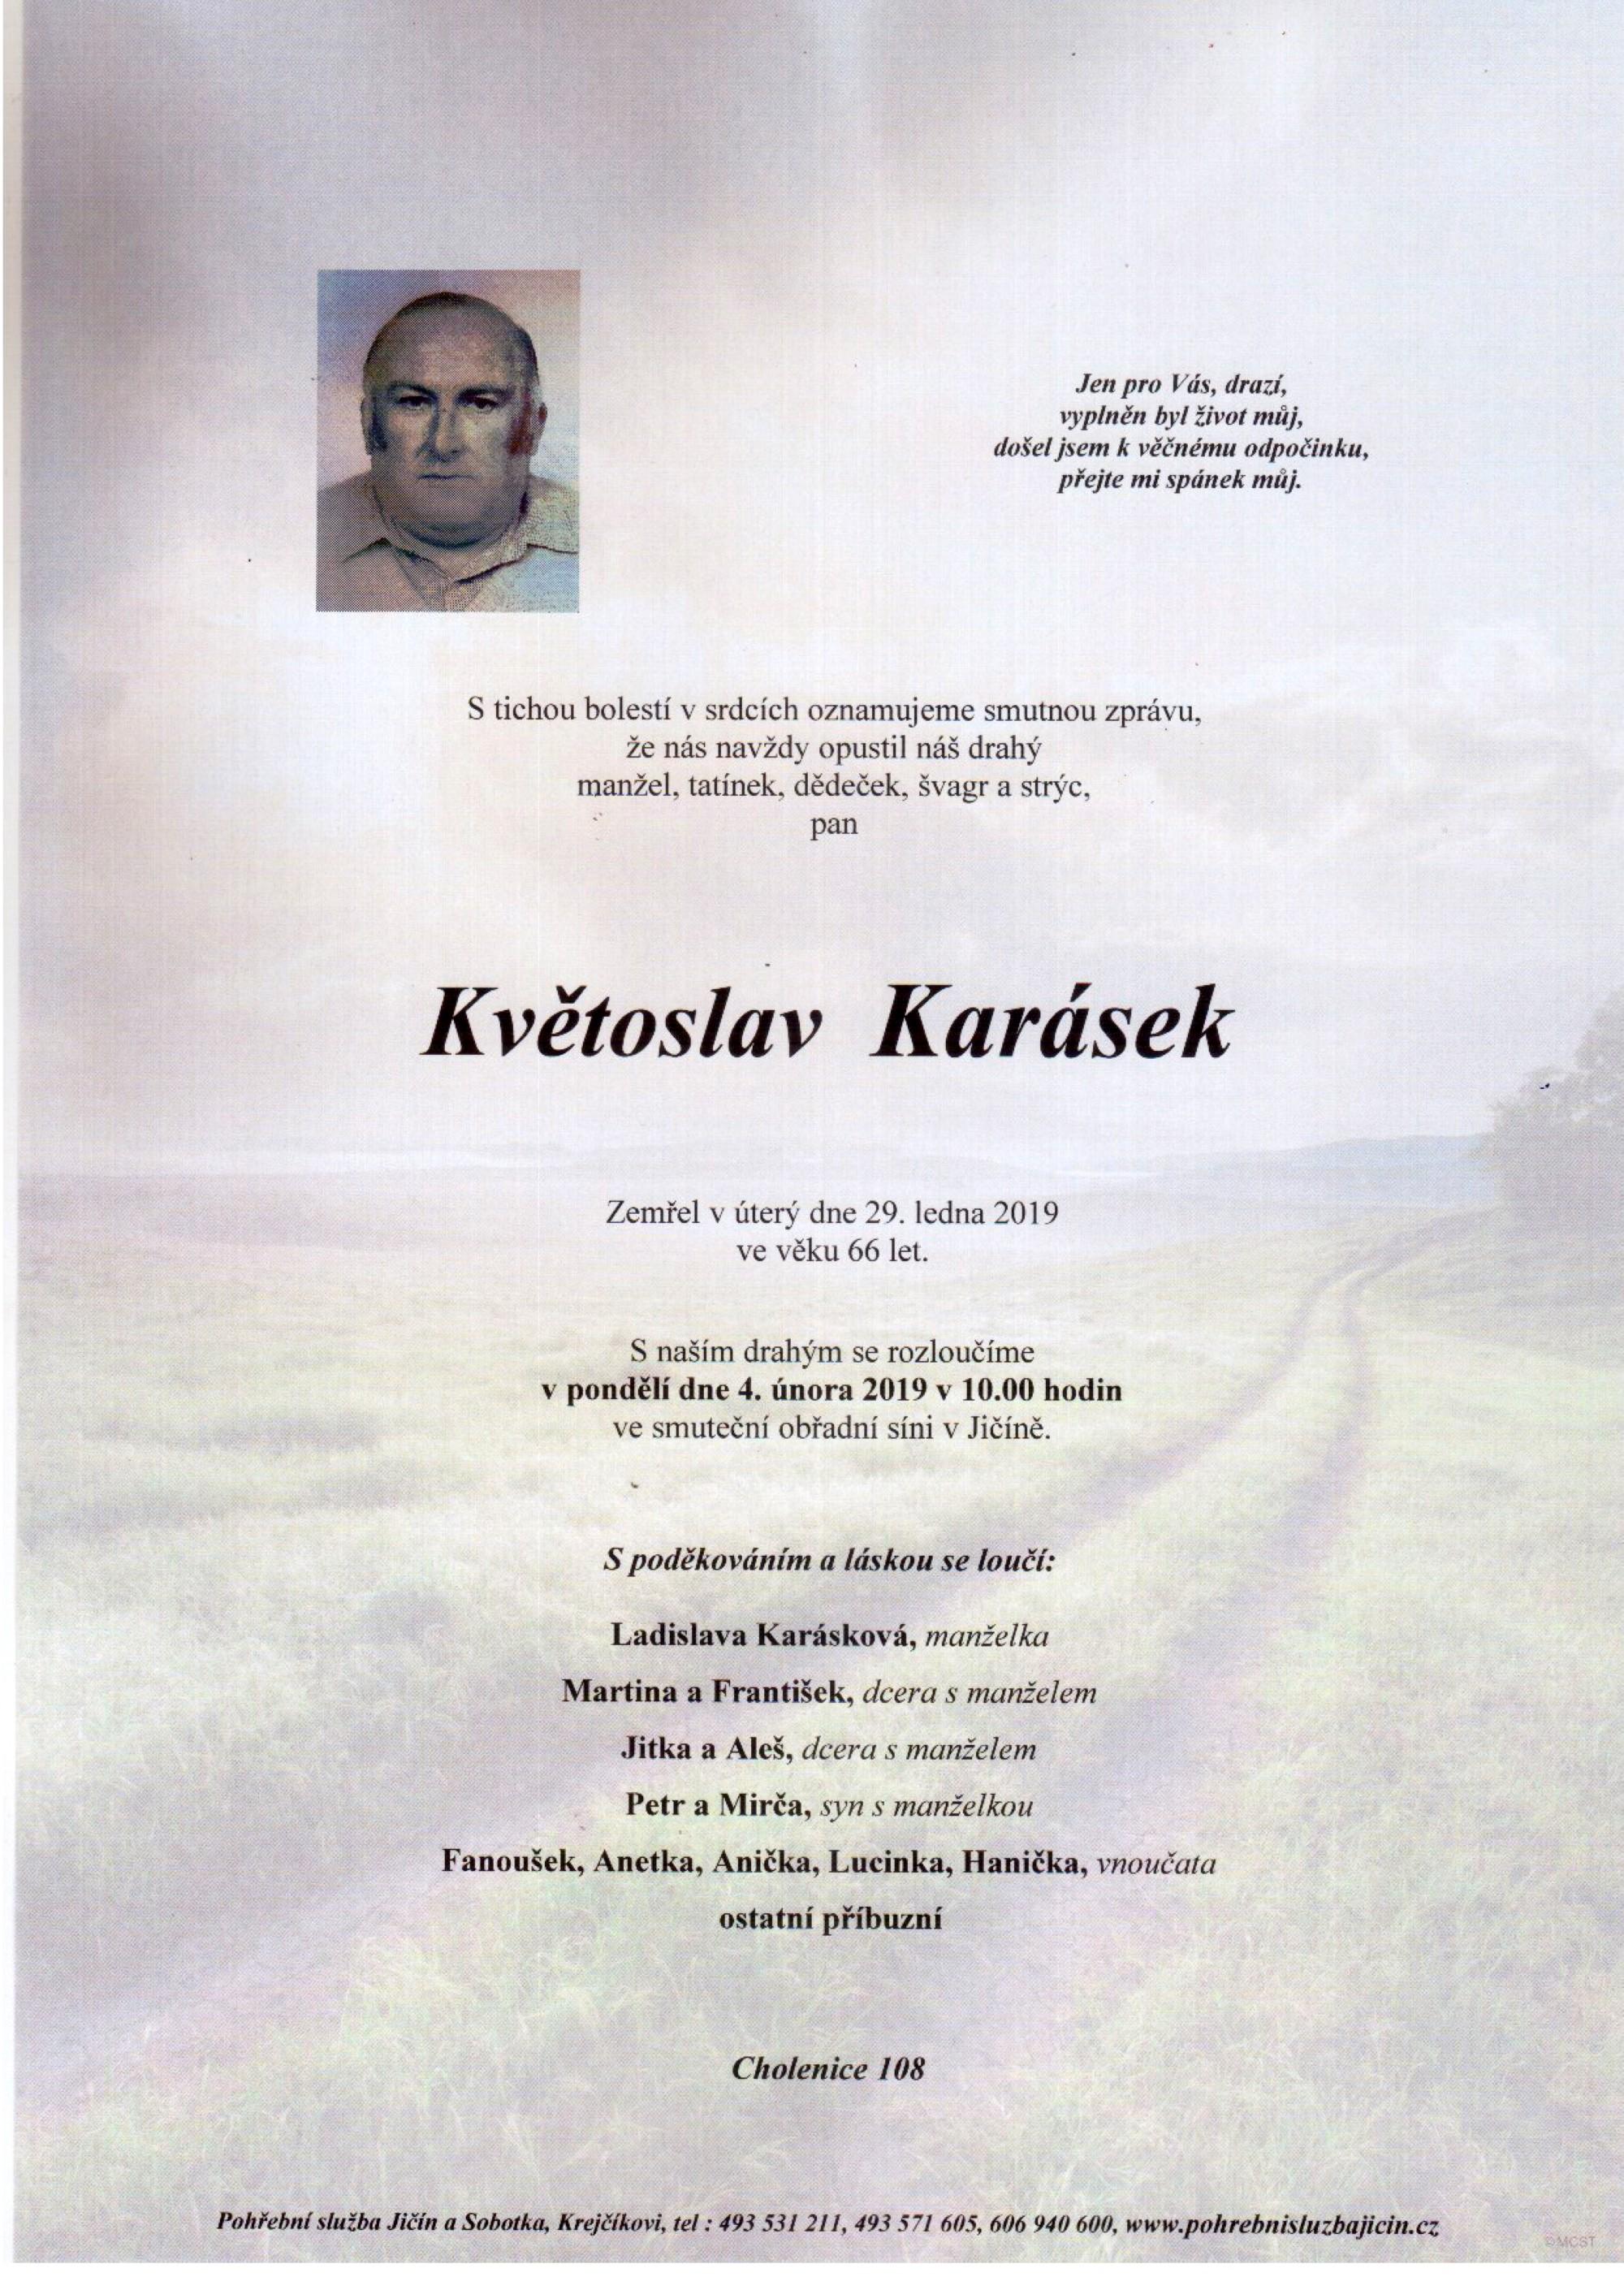 Květoslav Karásek